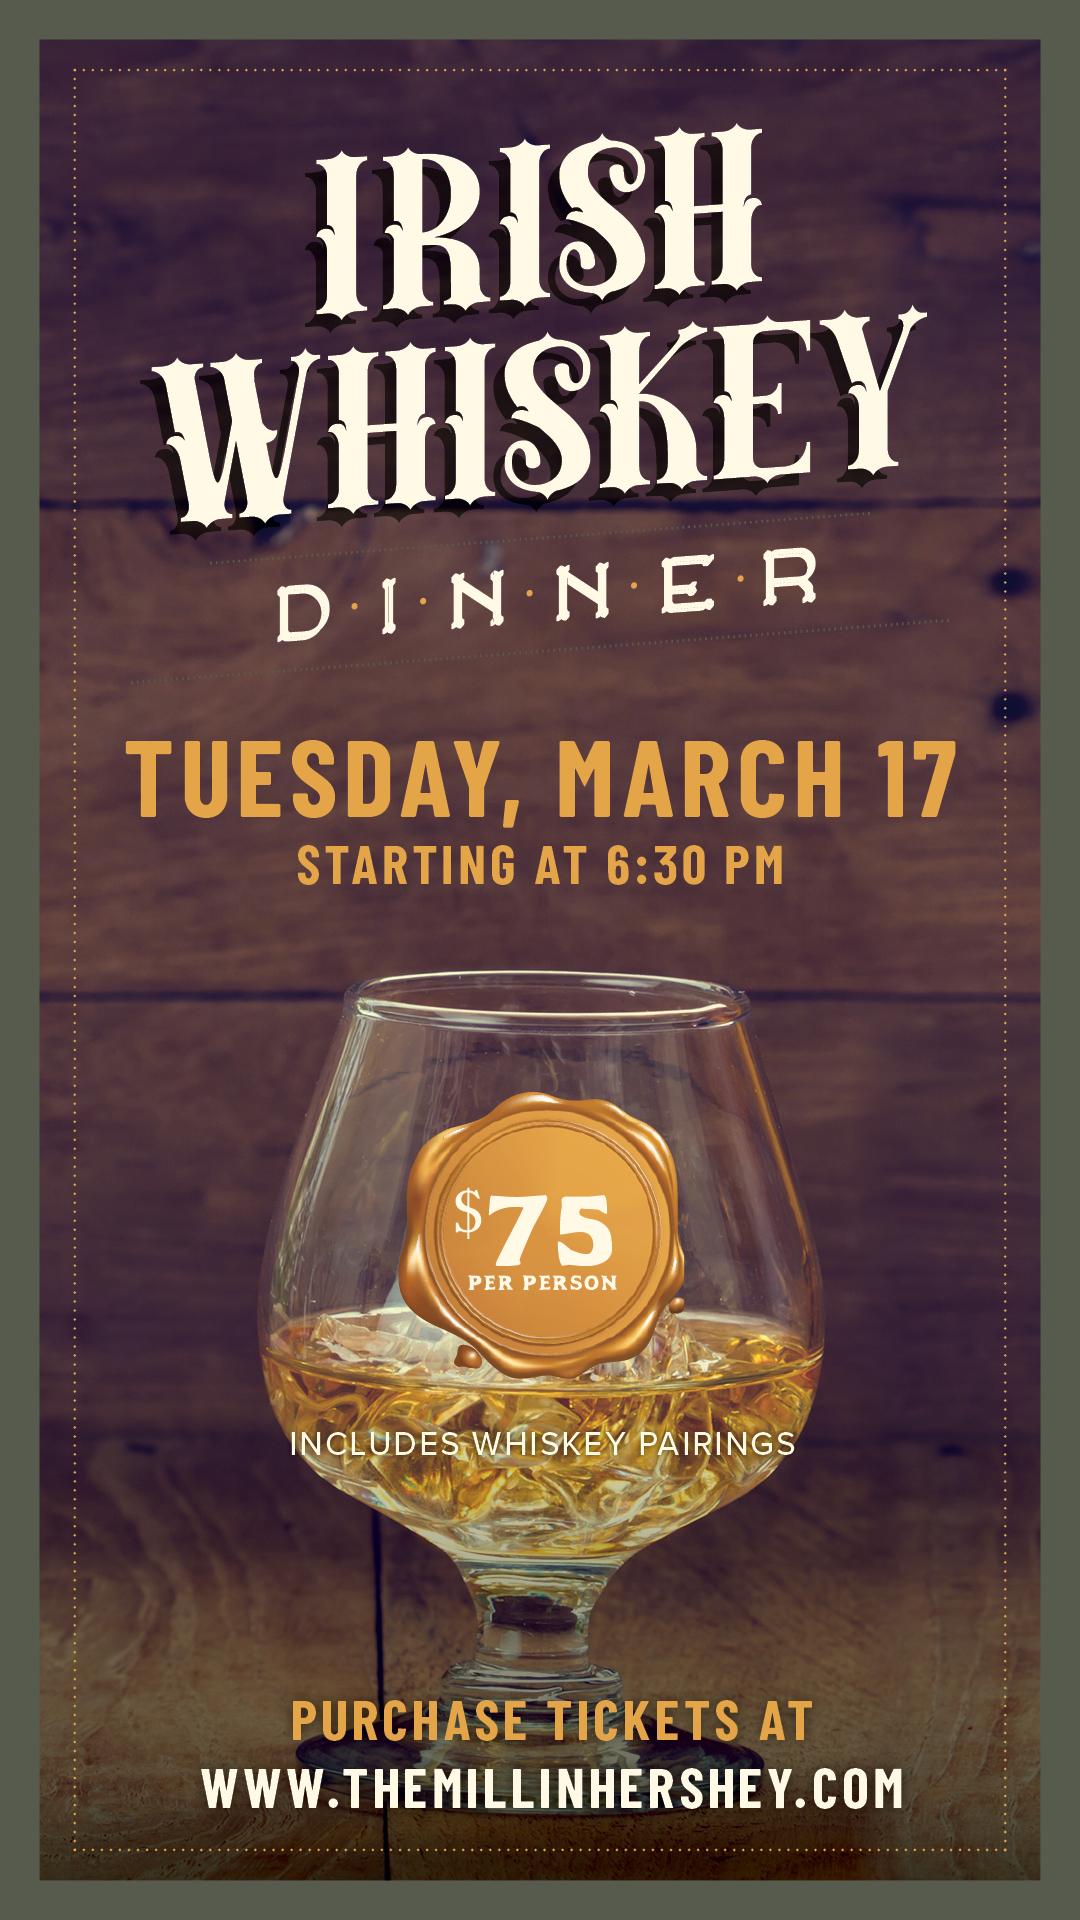 Irish Whiskey Dinner invite at the Mill